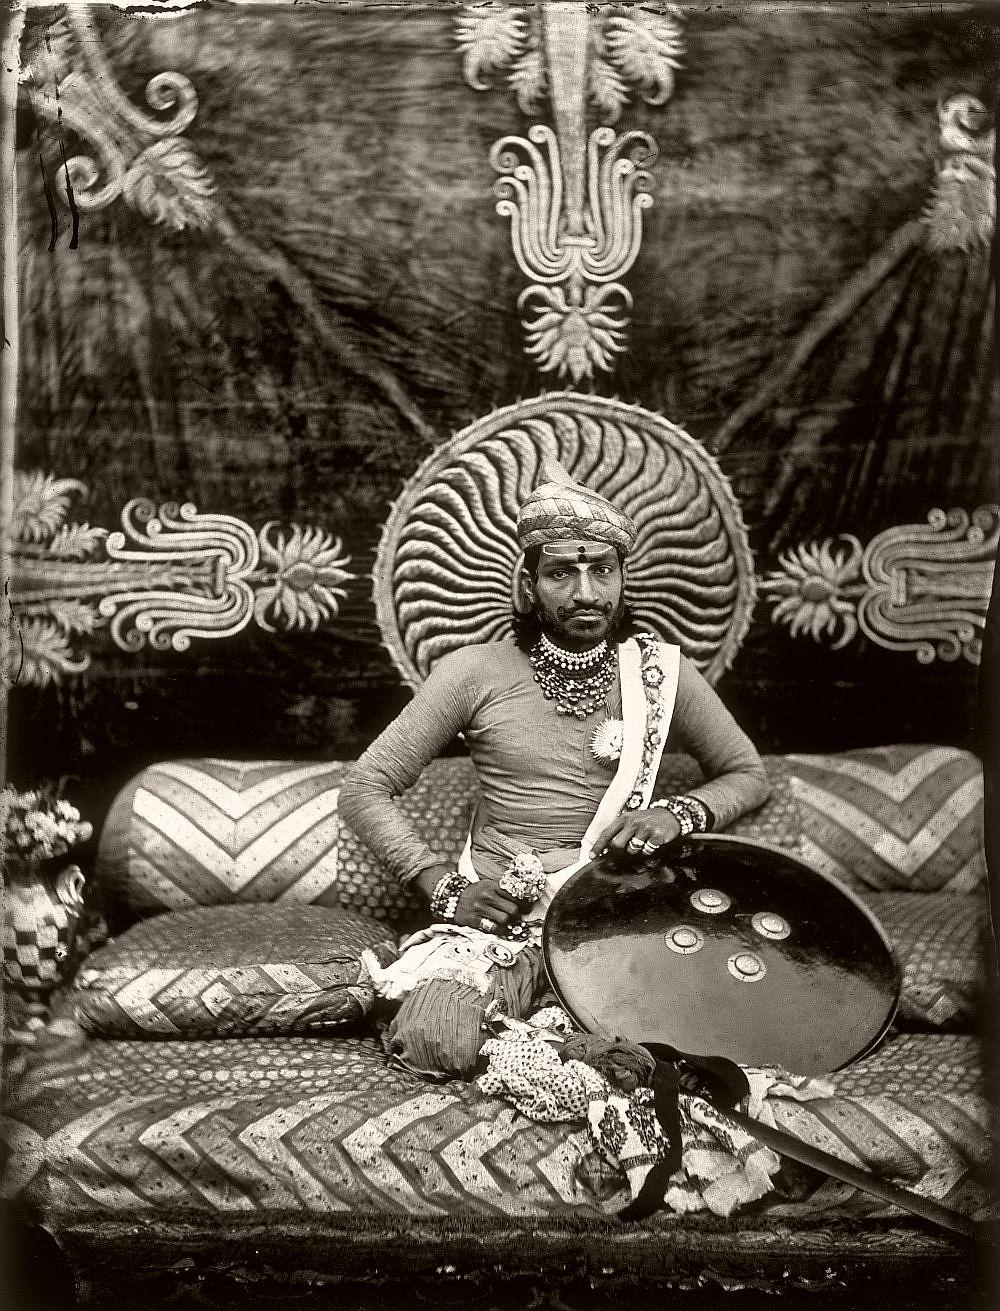 Self-portrait of the Maharajah Ram Singh III, in the royal palace of Jaipur, India, 1857–1865. (Photo by Maharaja Ram Singh III/Alinari via Getty Images)